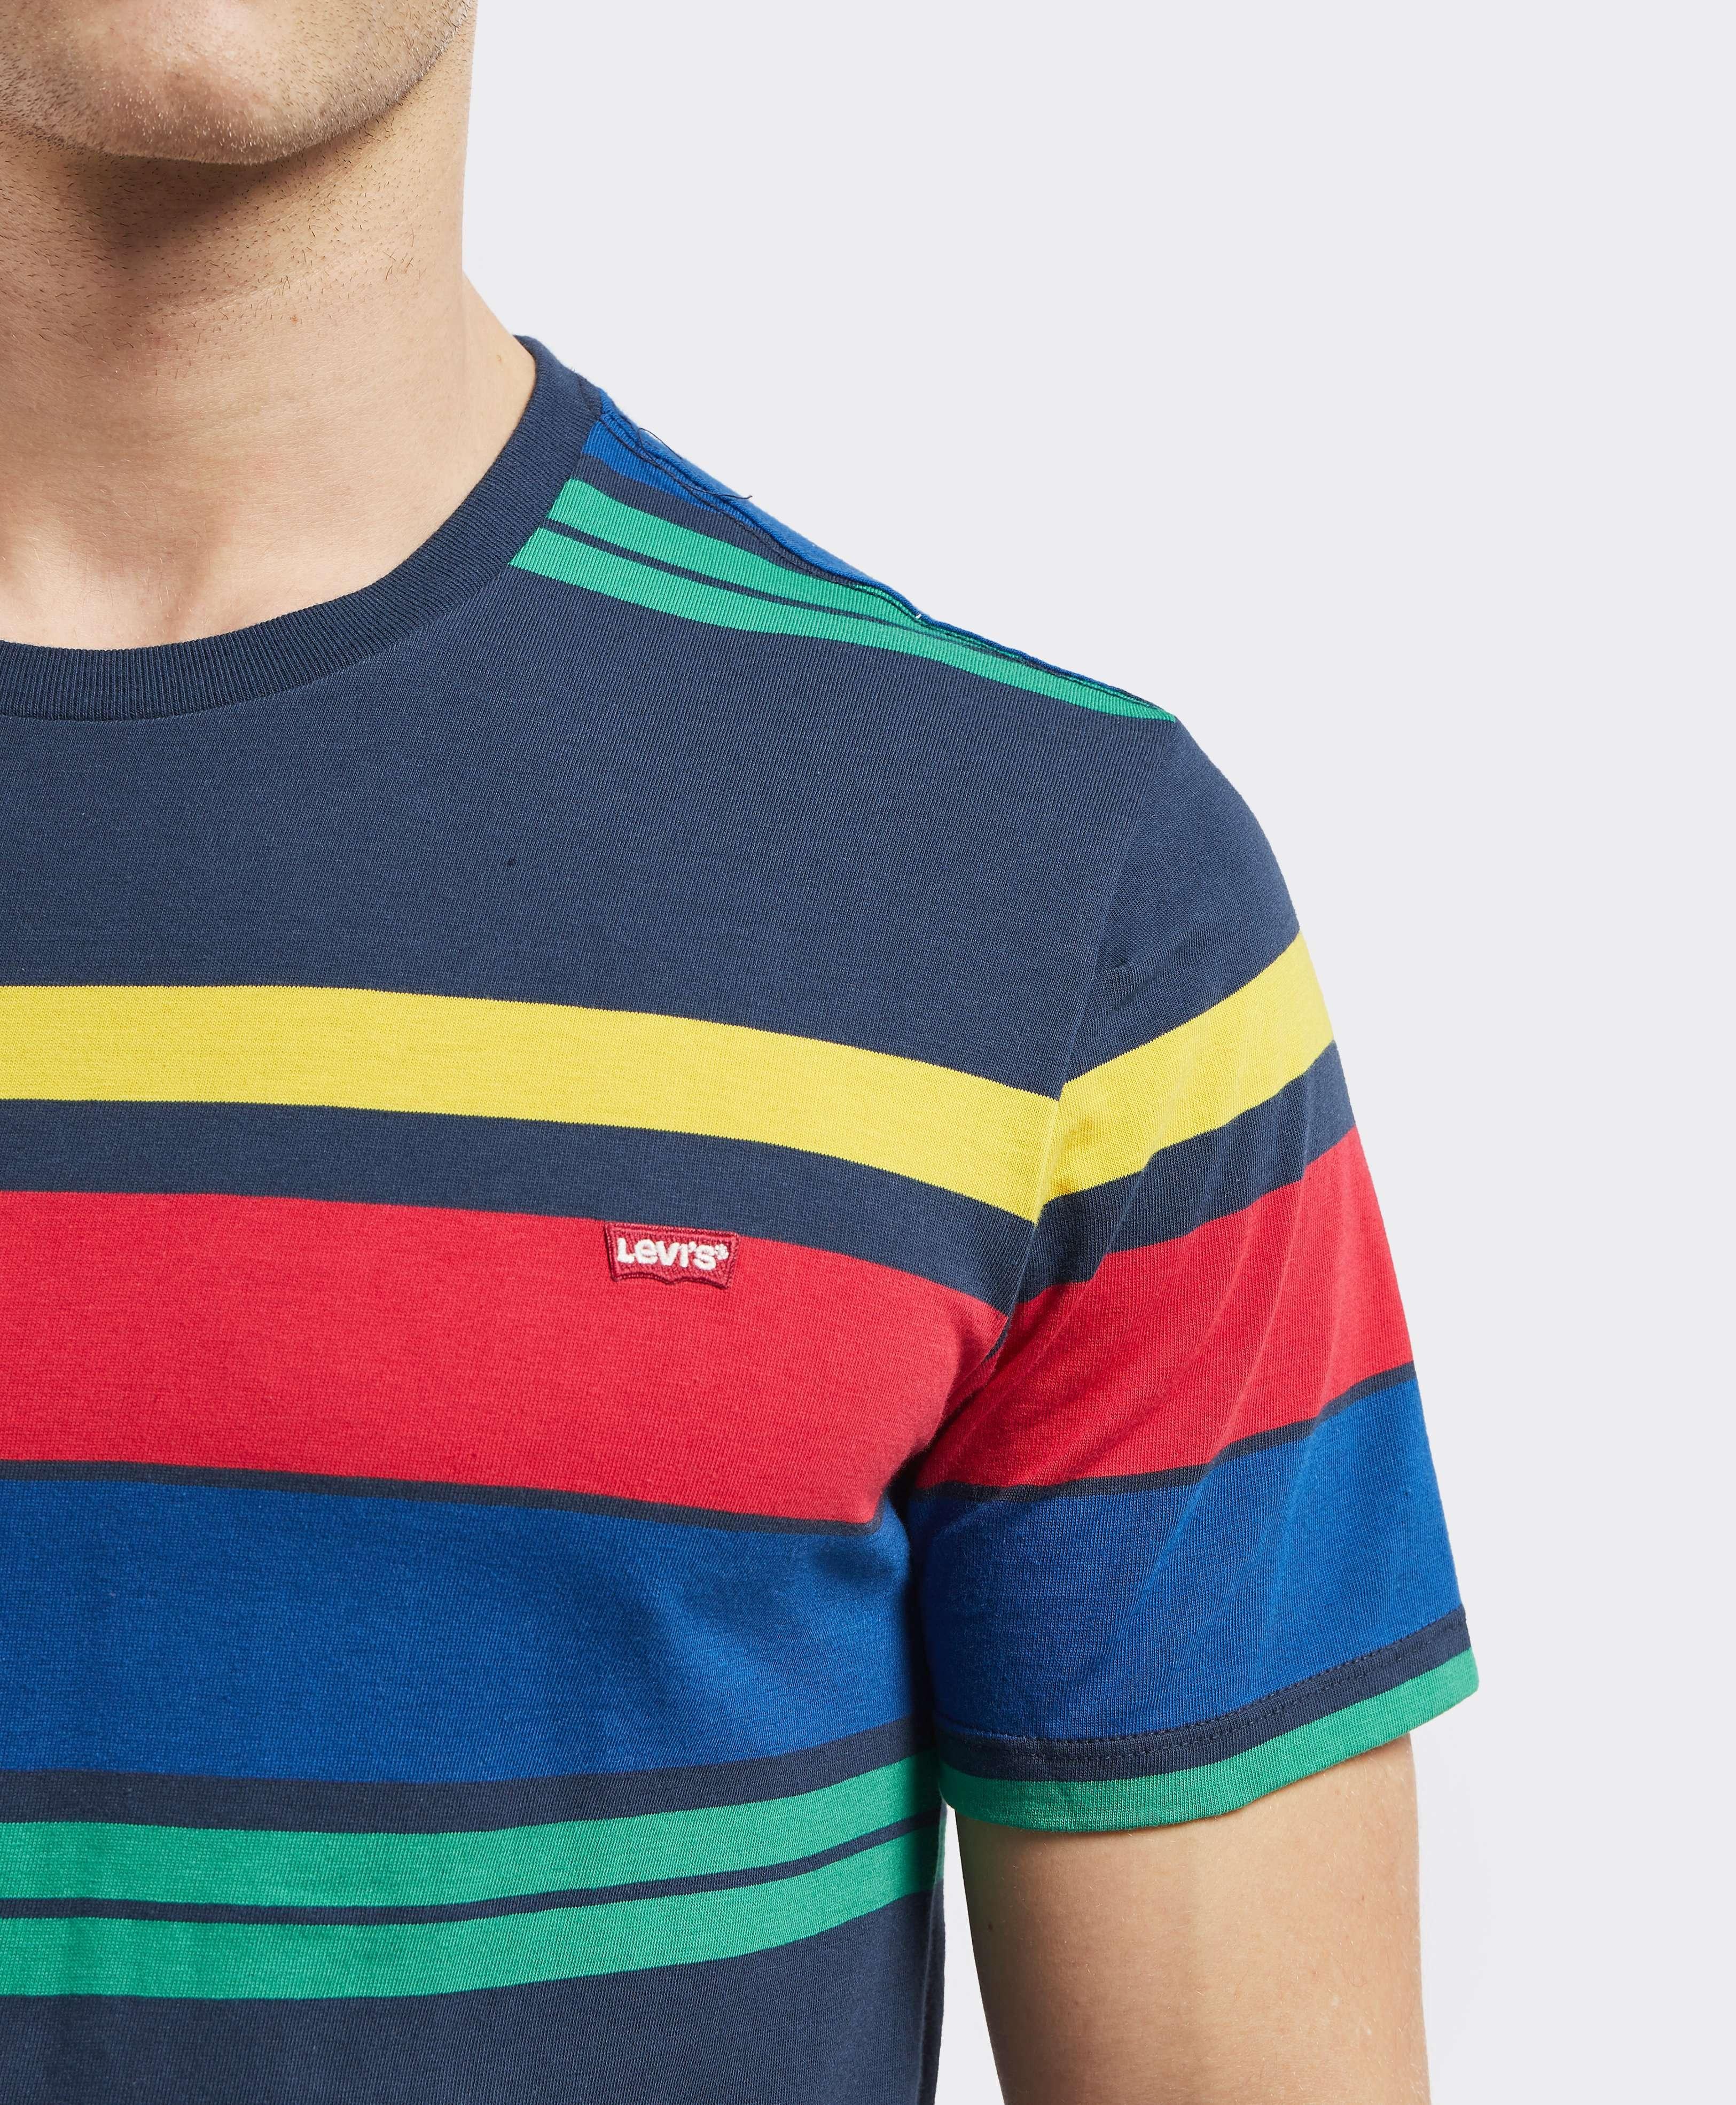 Levis Original Short Sleeve Stripe T-Shirt - Exclusive